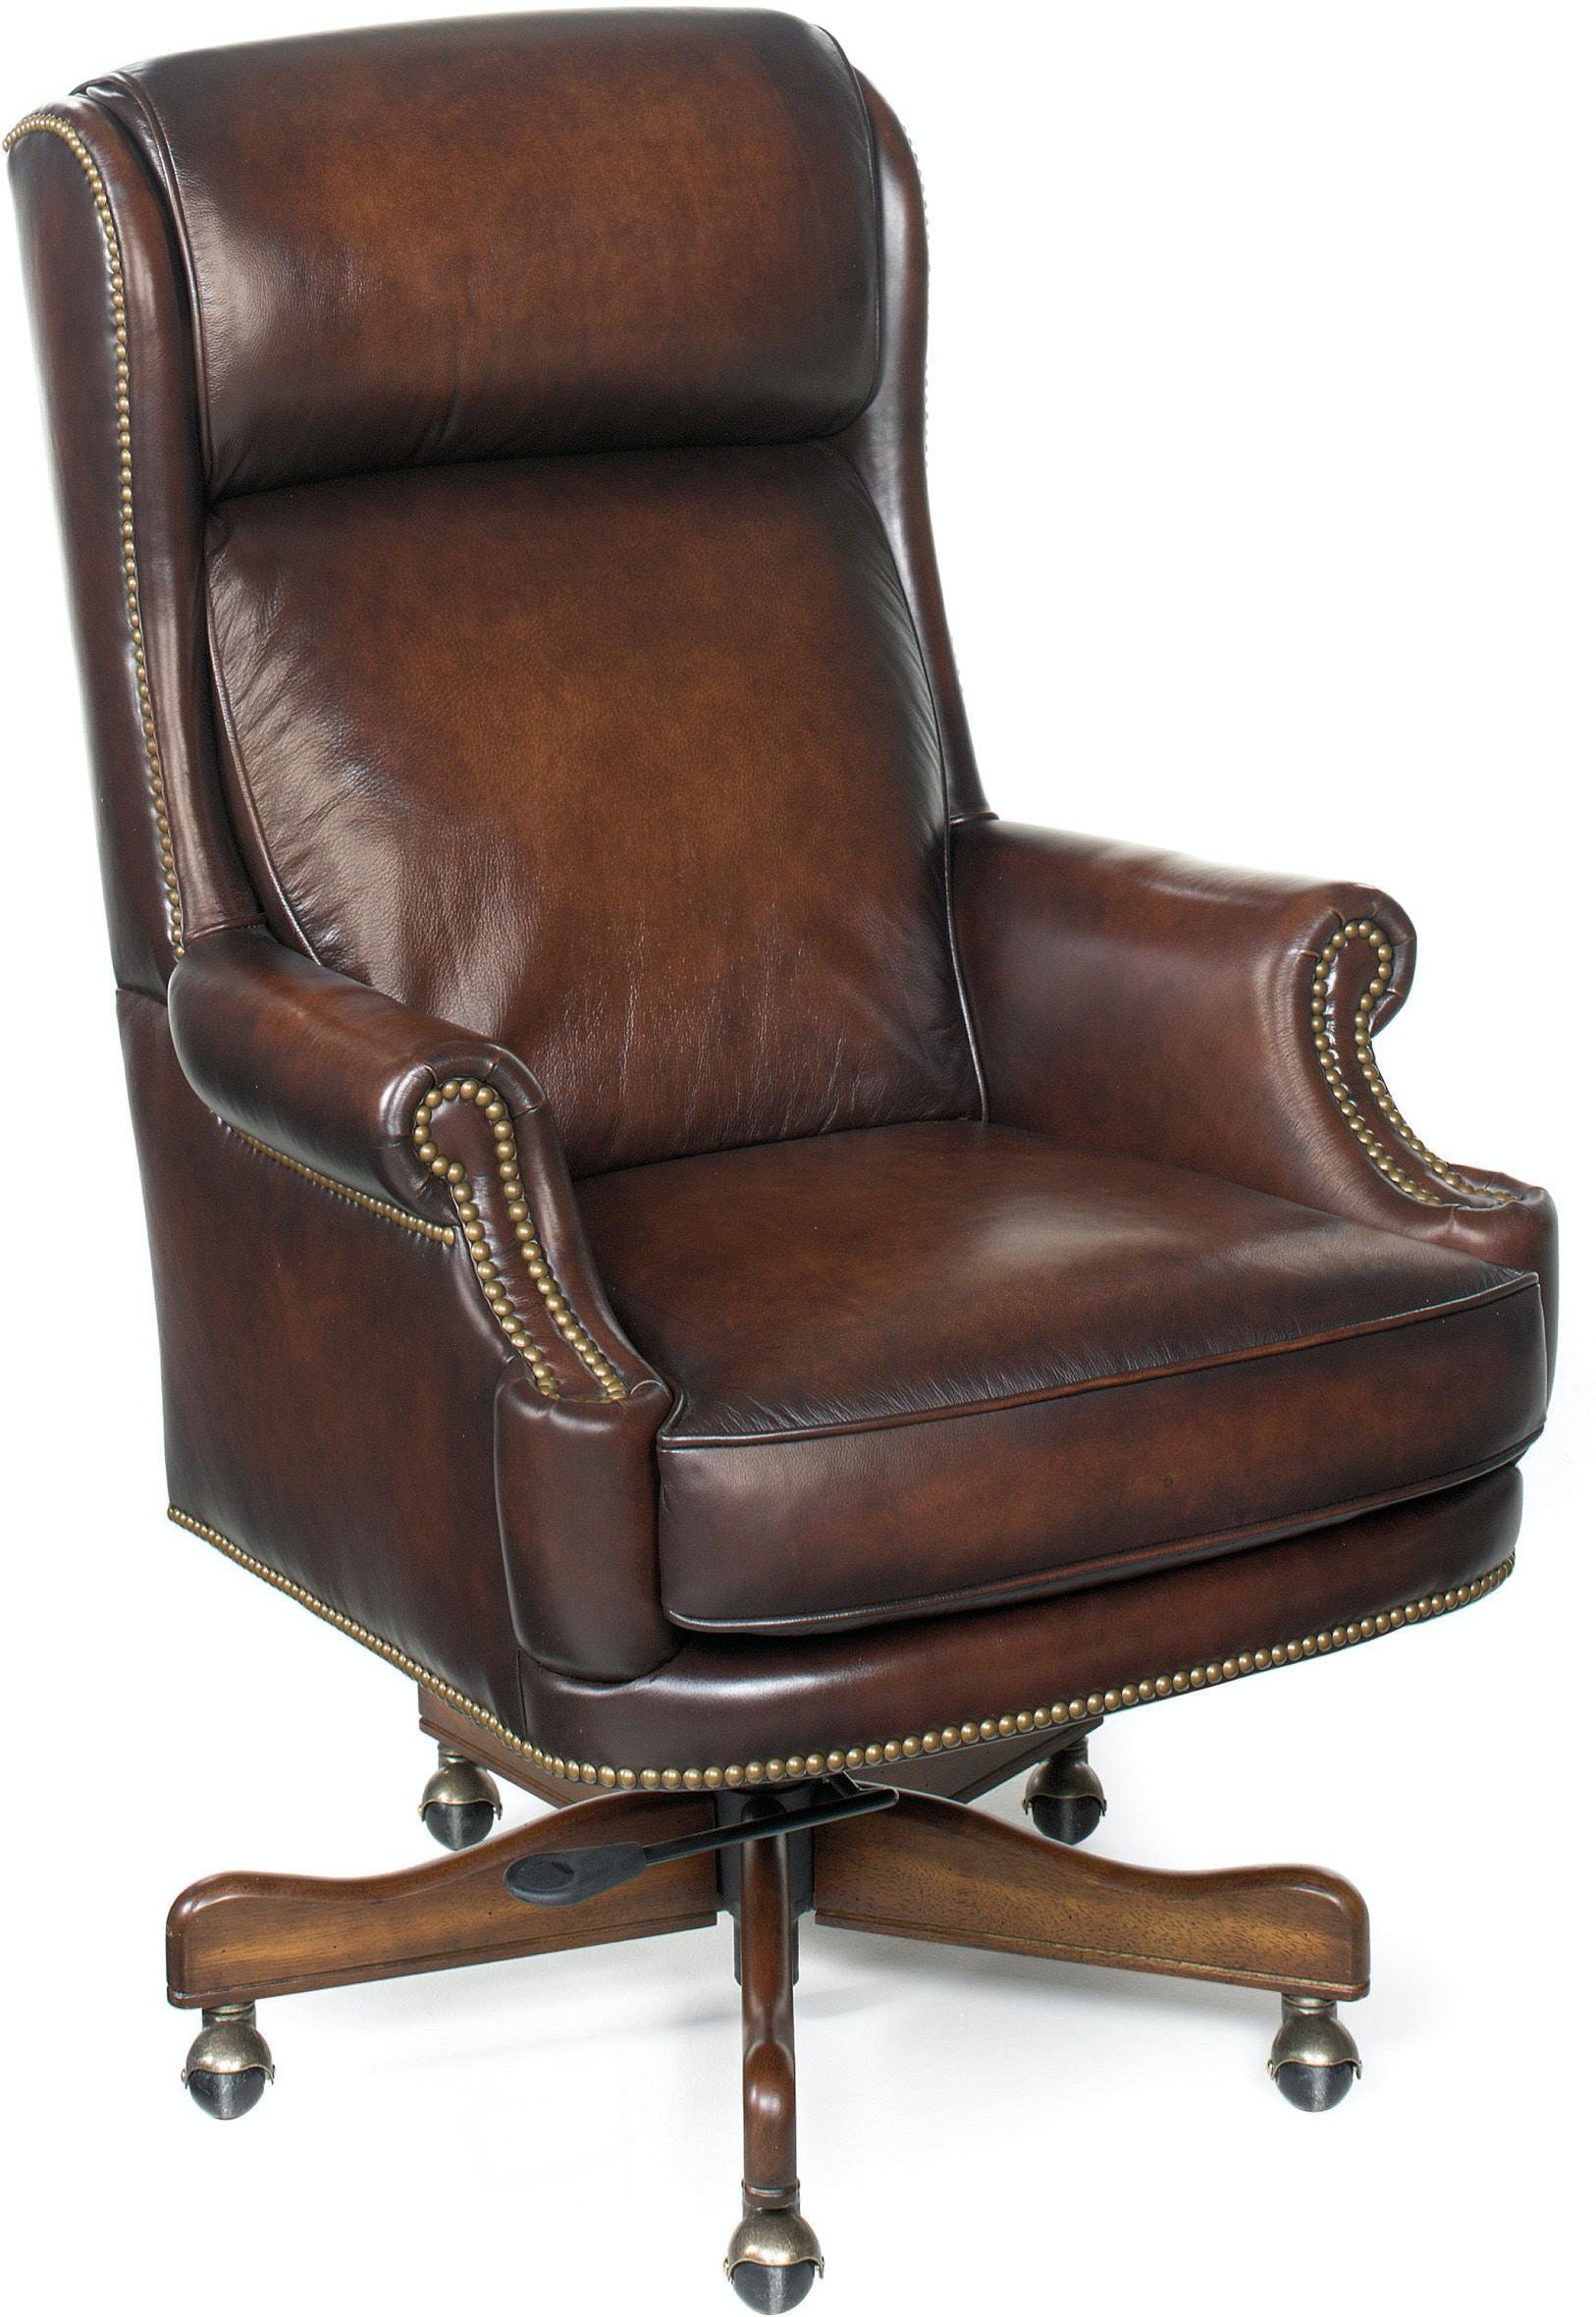 Hooker Furniture Home Office Kevin Executive Swivel Tilt Chair HSEC39  Walter E. Smithe Furniture + Design